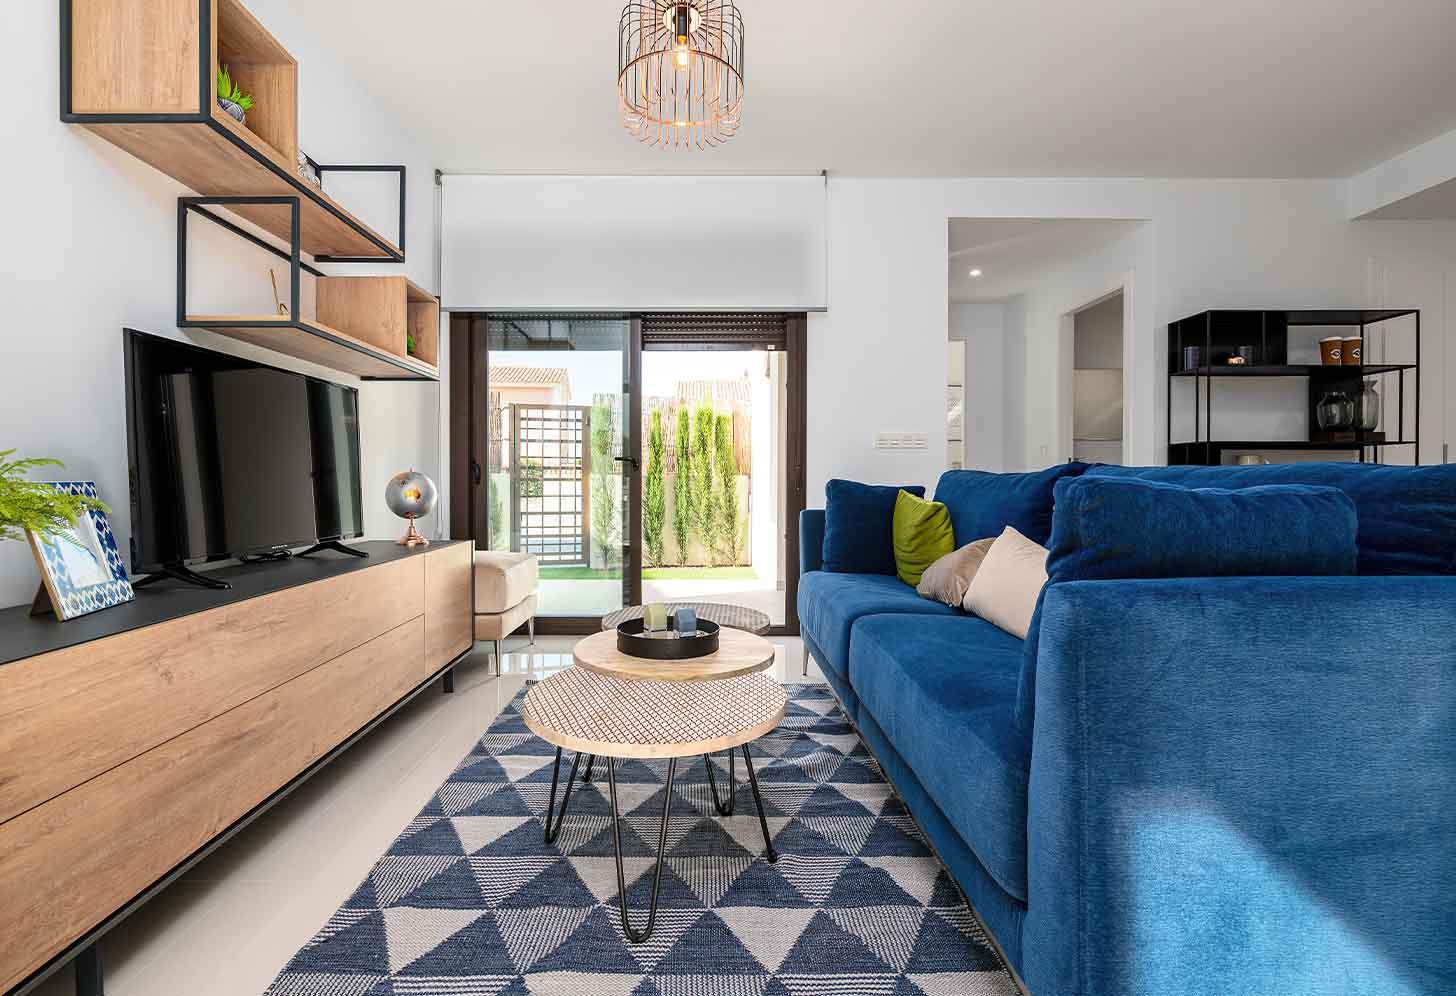 immobilier neuf espagne costa blanca on-o3 lagos salon